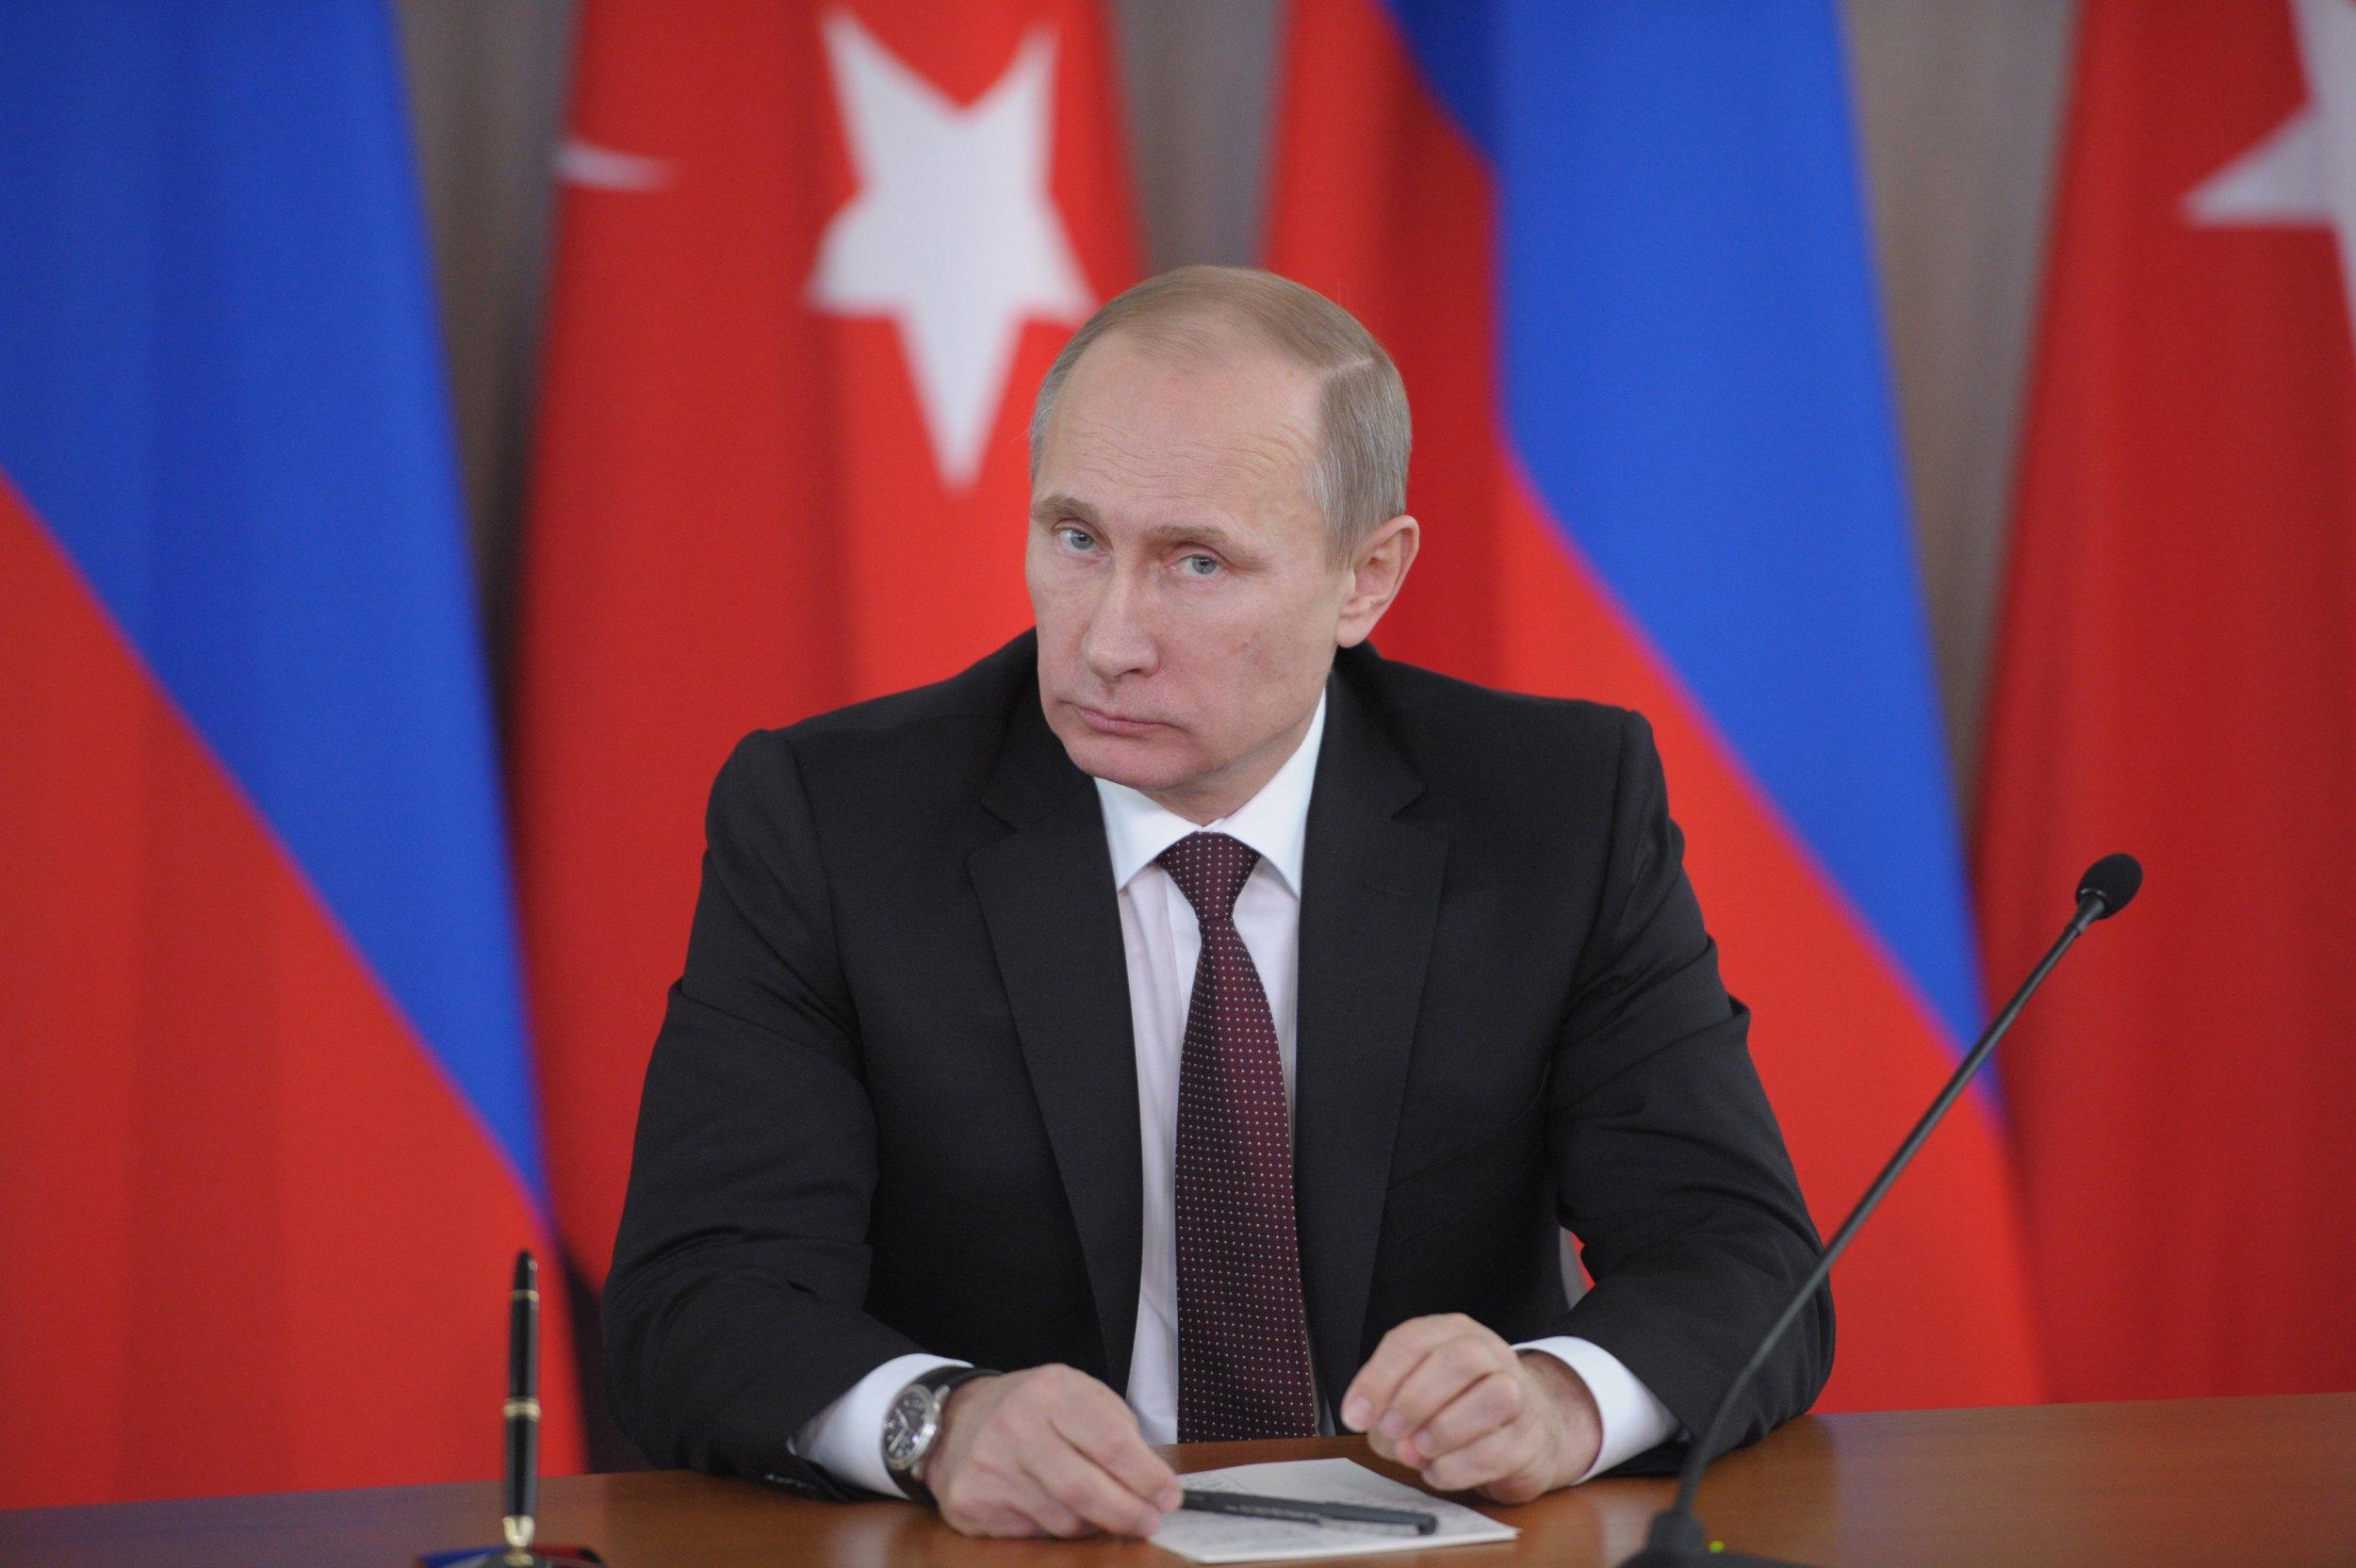 Putin supports Assad